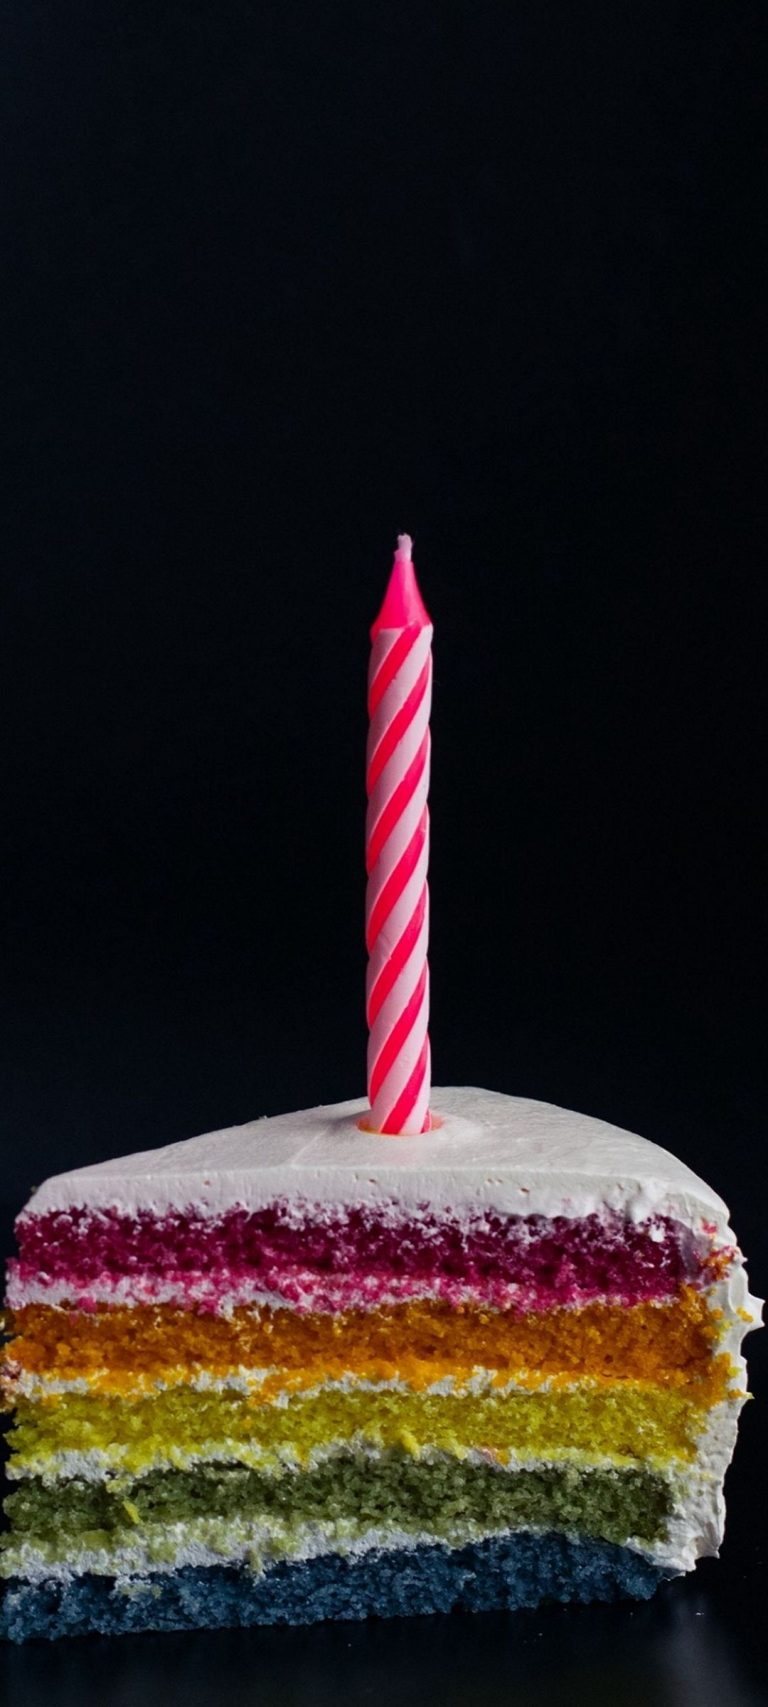 Candle Cake Food 1080x2400 768x1707